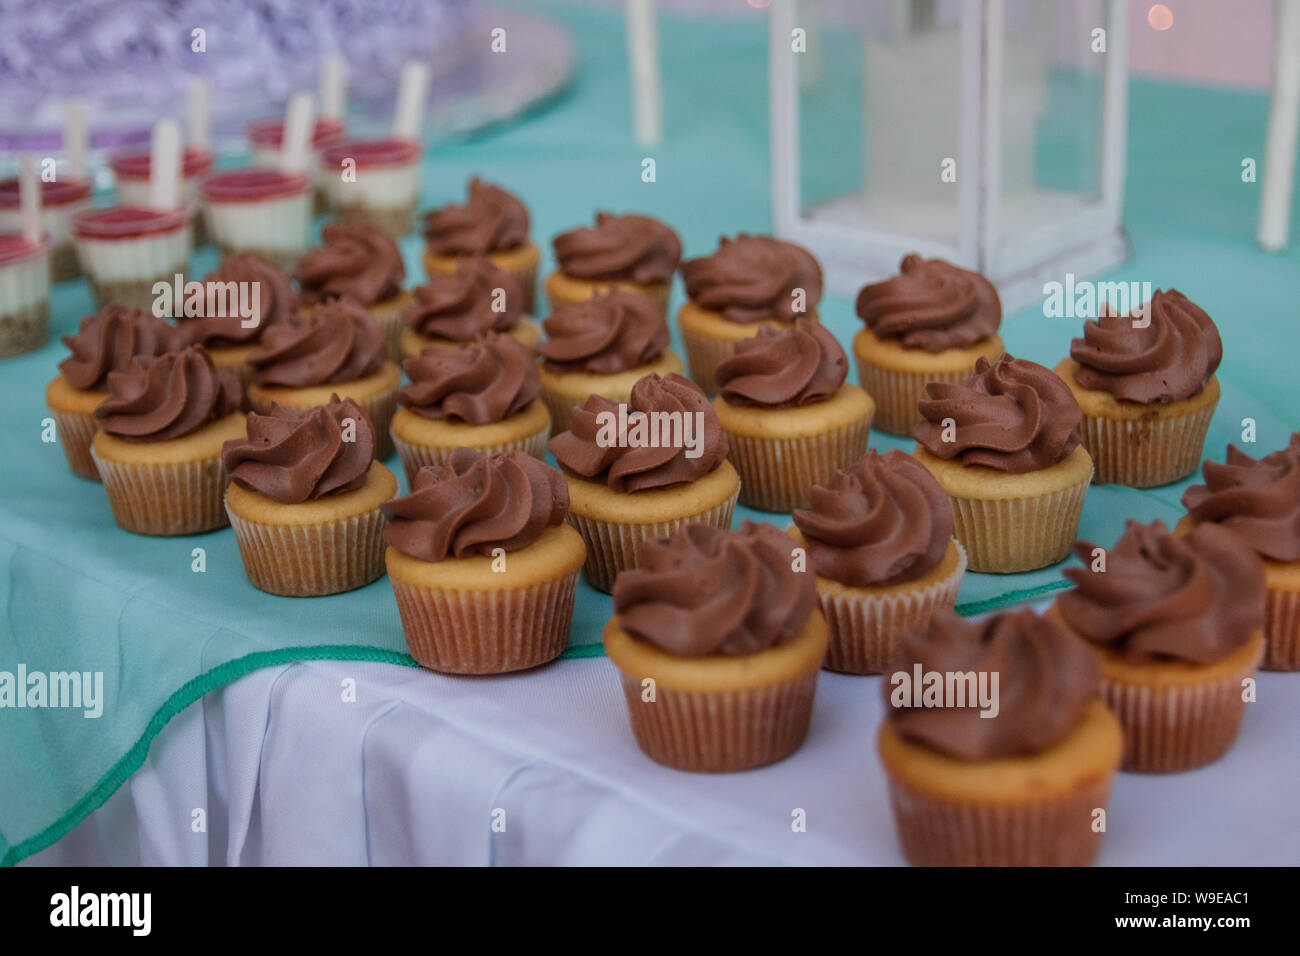 Rosa Mit Bildern Cupcake Ideen Geburtstag Leckere Cupcakes